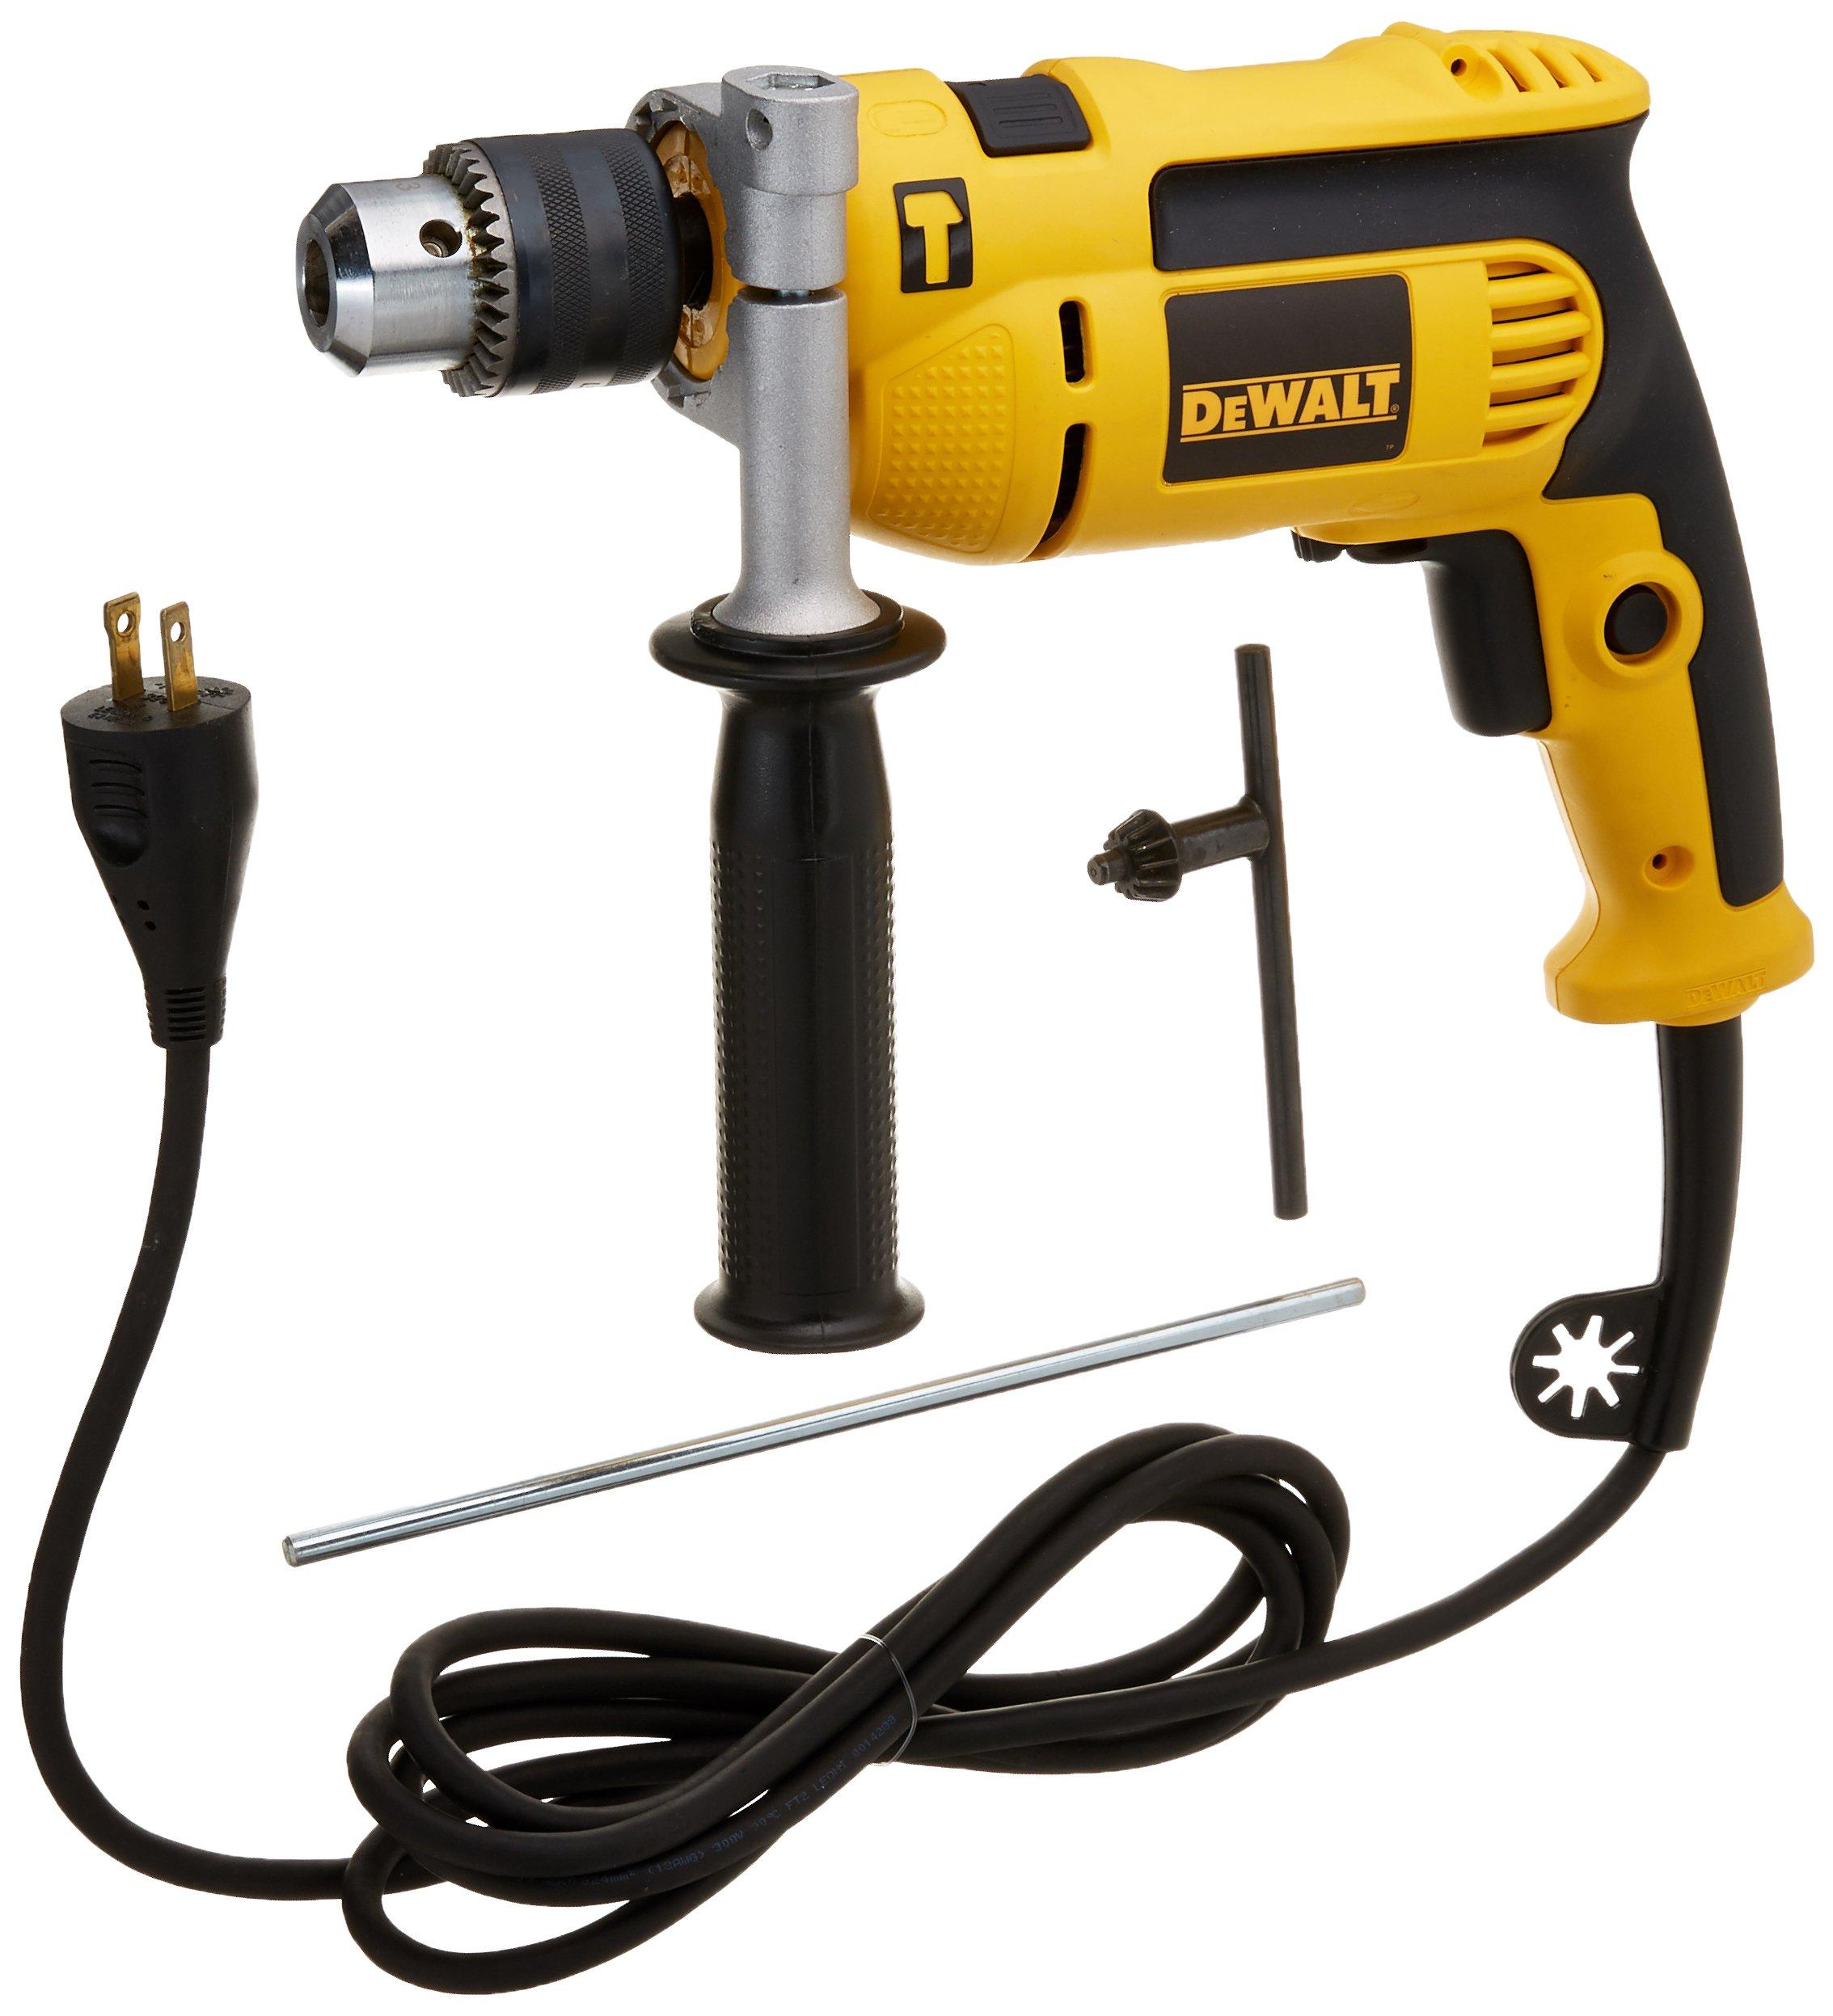 Dewalt DWE5010R 7 Amp 1/2 in. VSR Single Speed Hammer Drill Kit (Certified Refurbished)